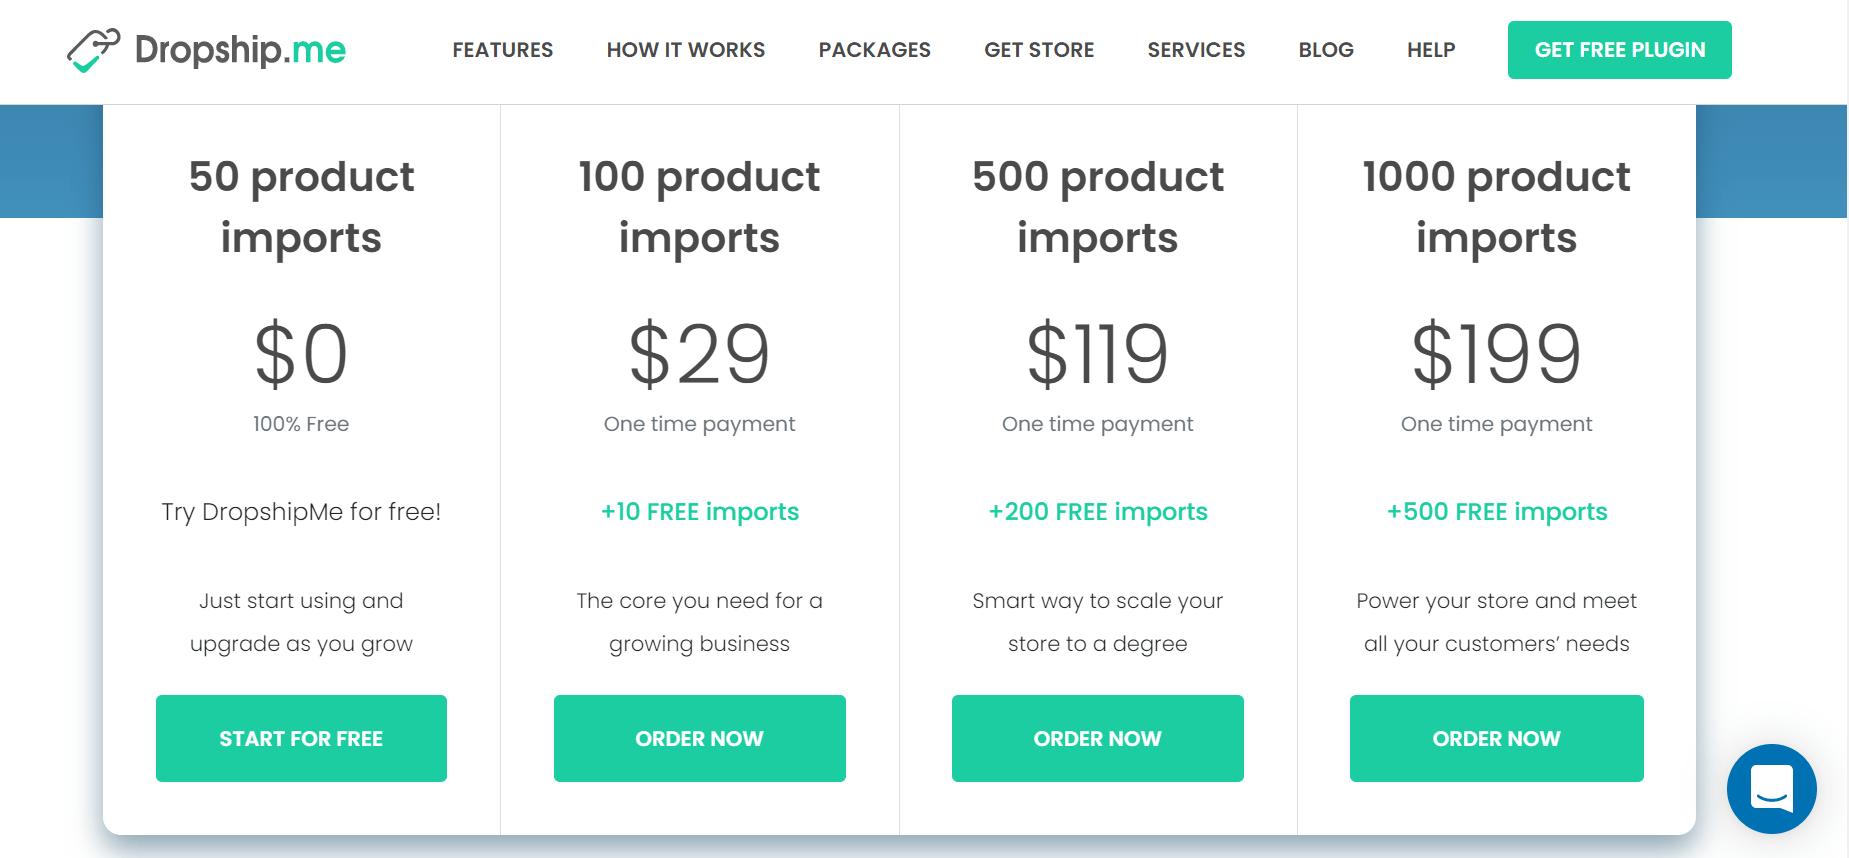 dropship.me pricing